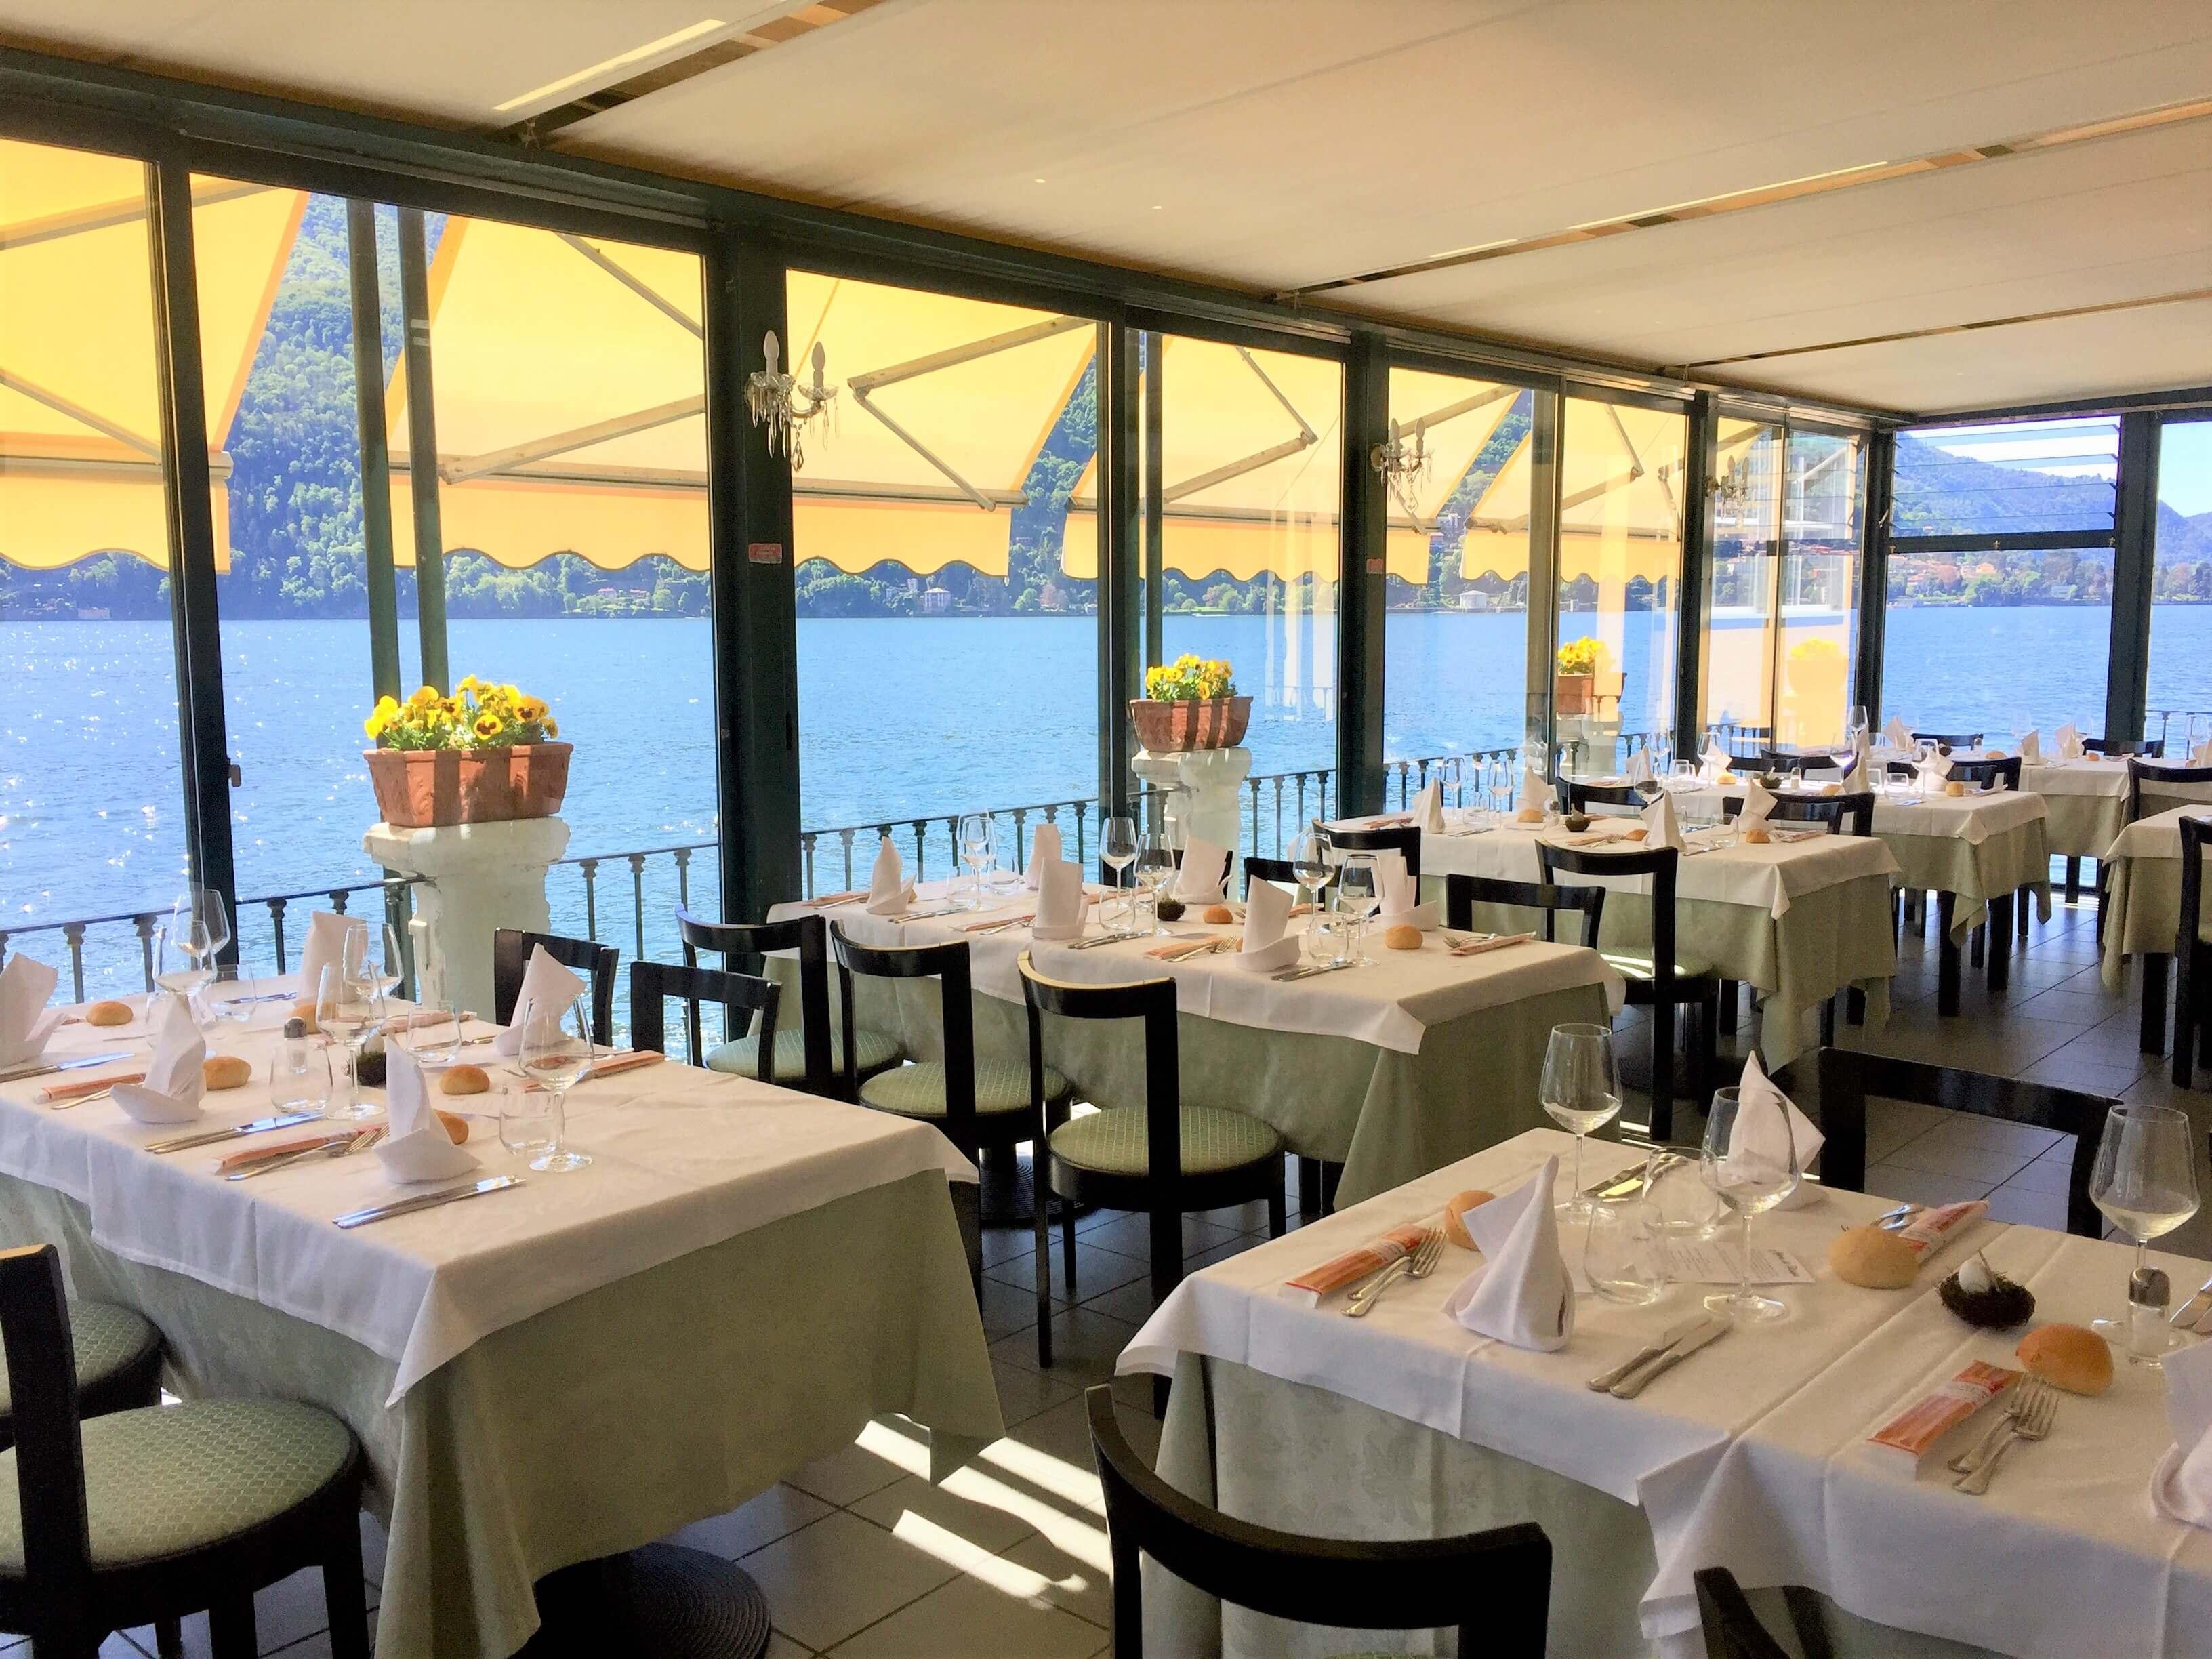 Hotel Fioroni_veranda